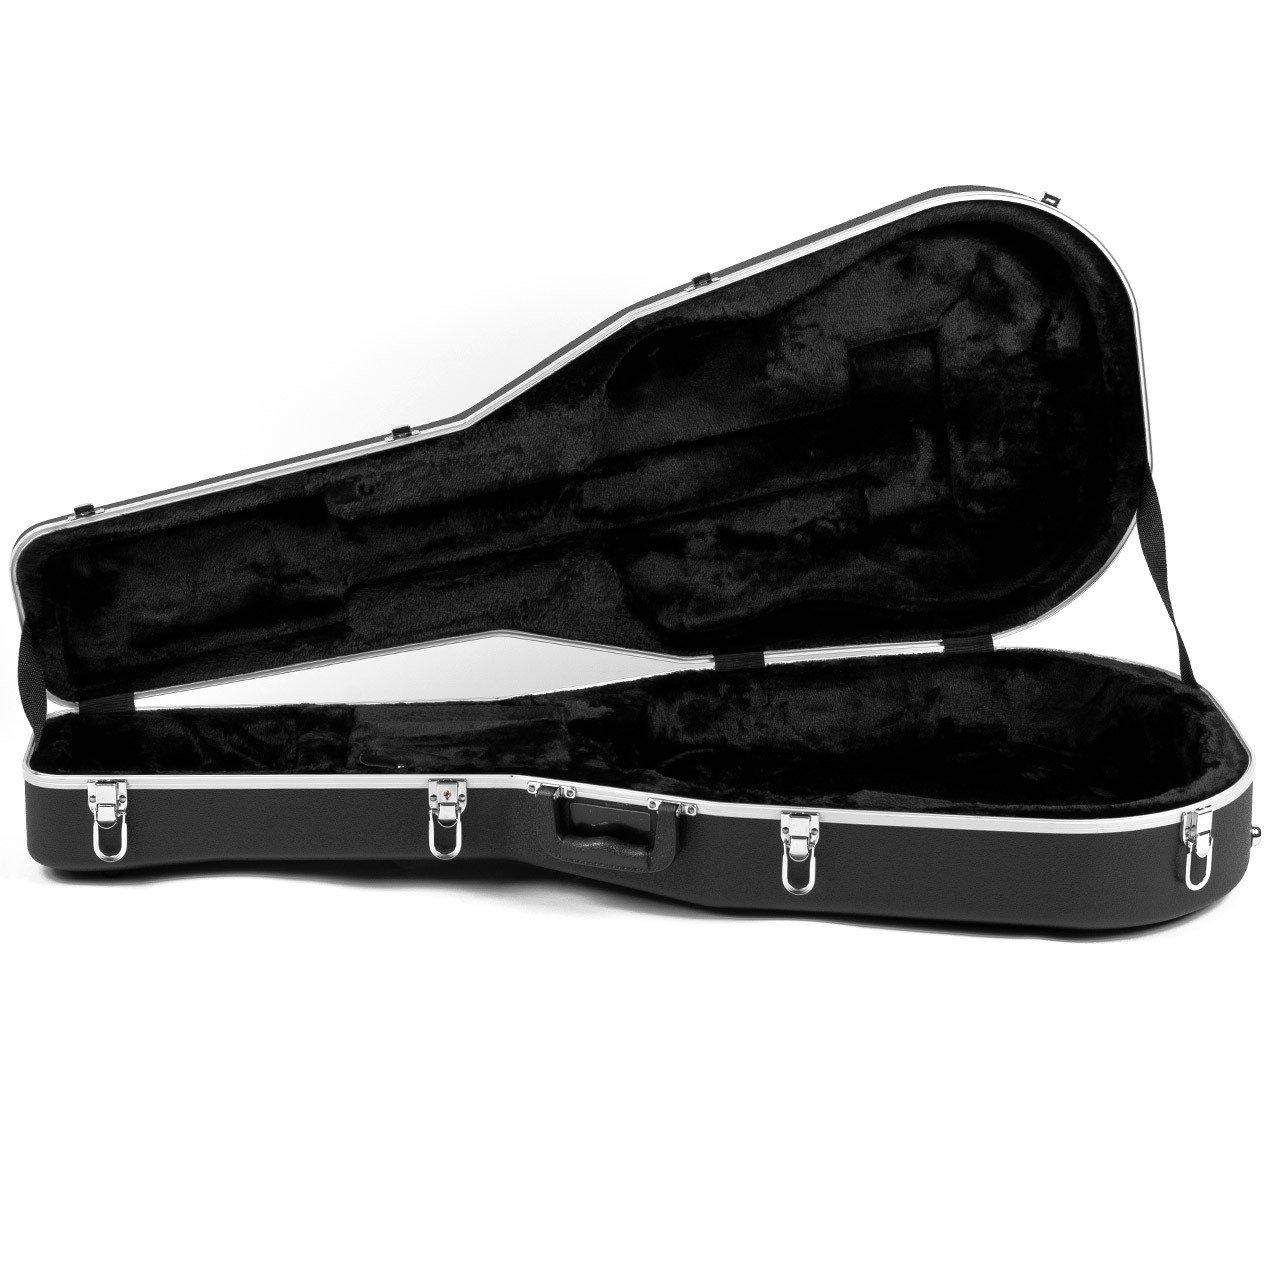 Guardian CG-041-D ABS Case Dreadnought Guitar